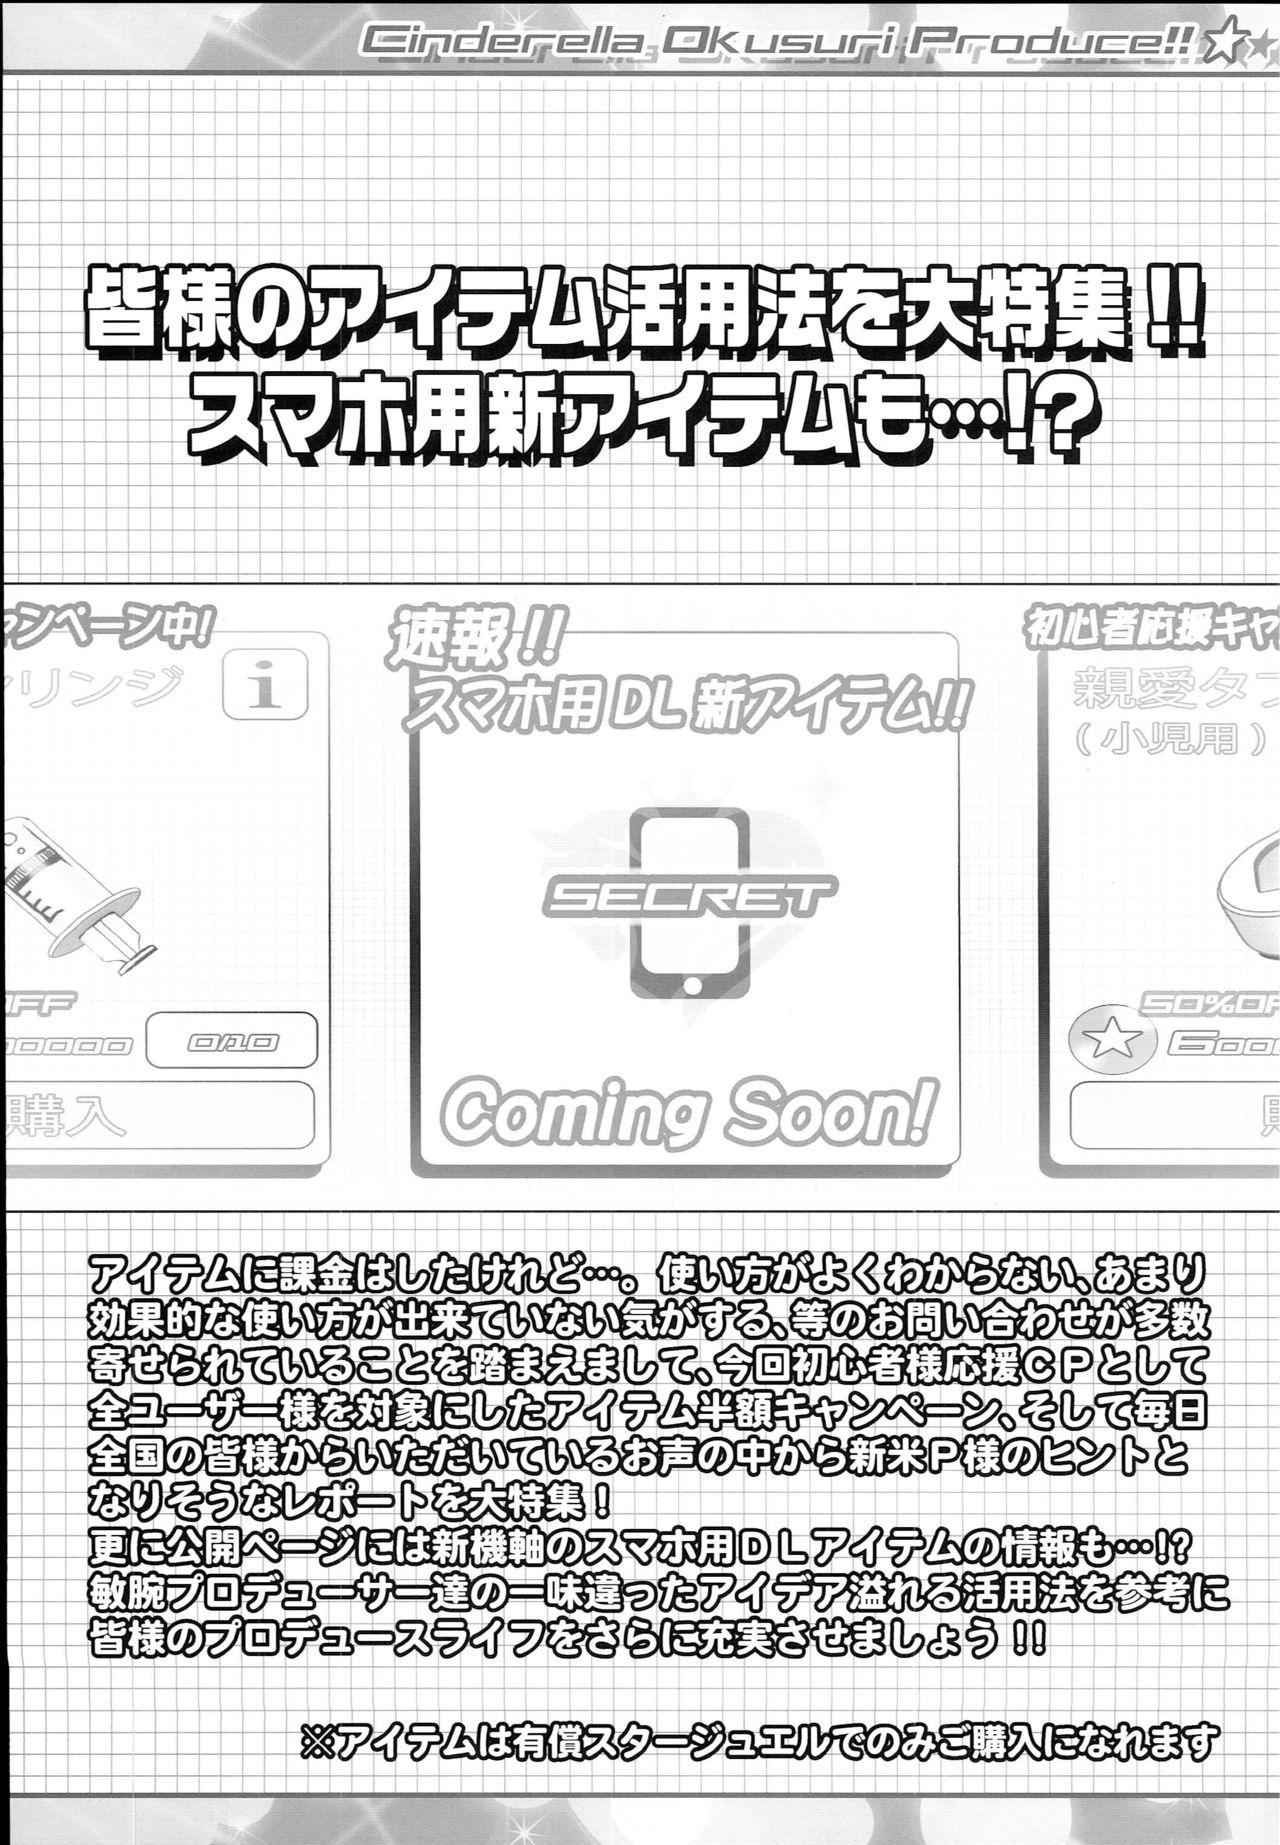 Cinderella Okusuri Produce!! ☆★ 4